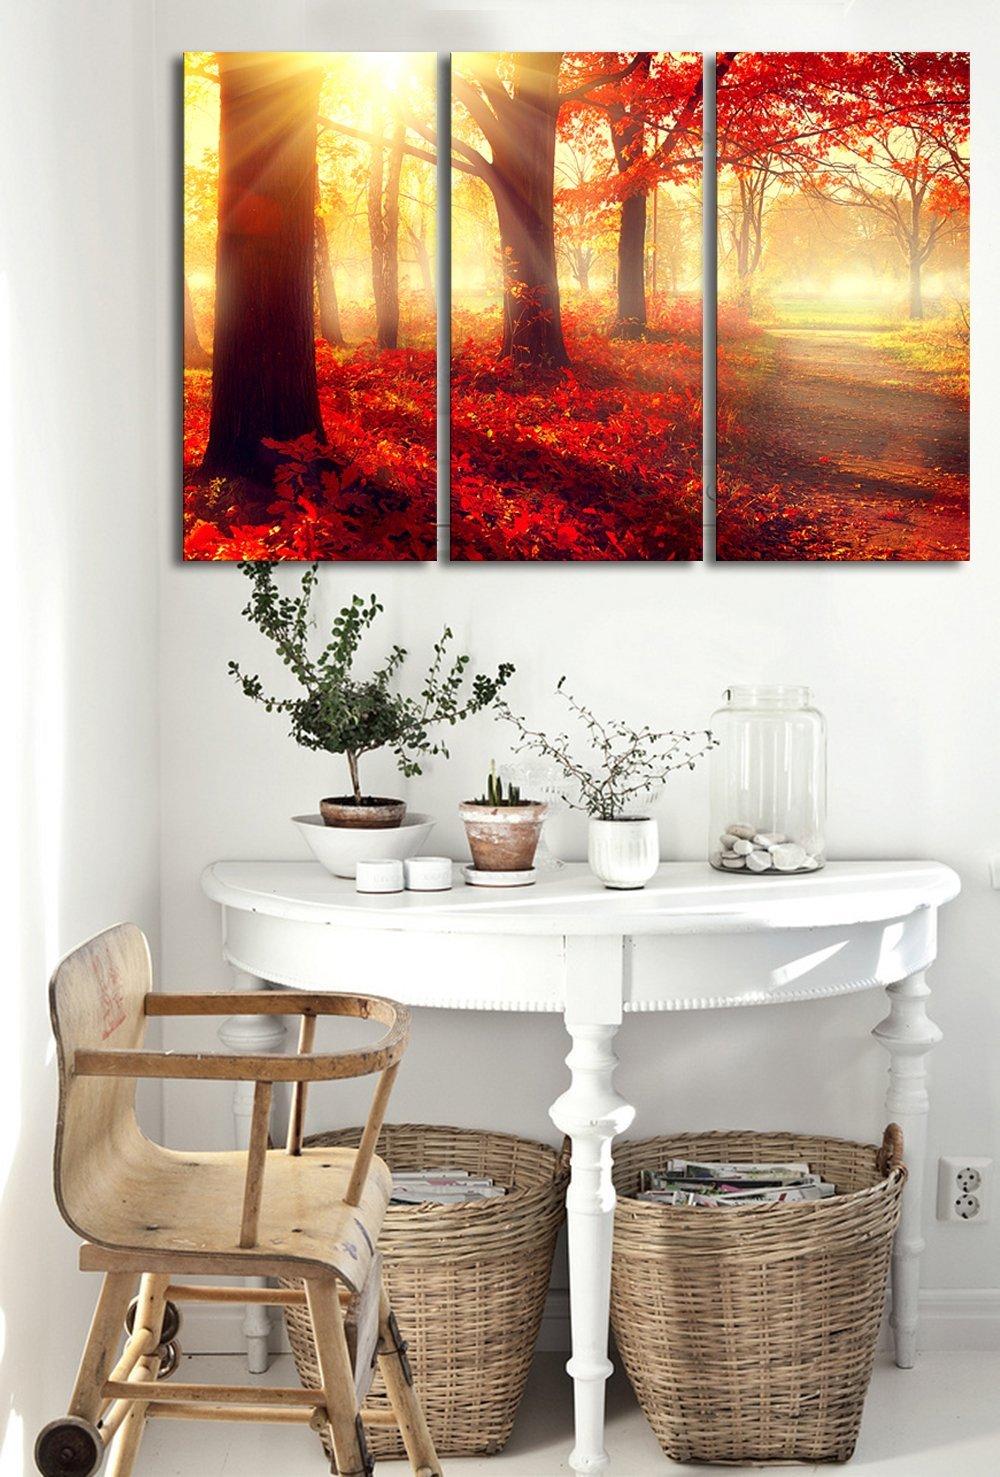 cheap wall art panels find wall art panels deals on line at alibaba com